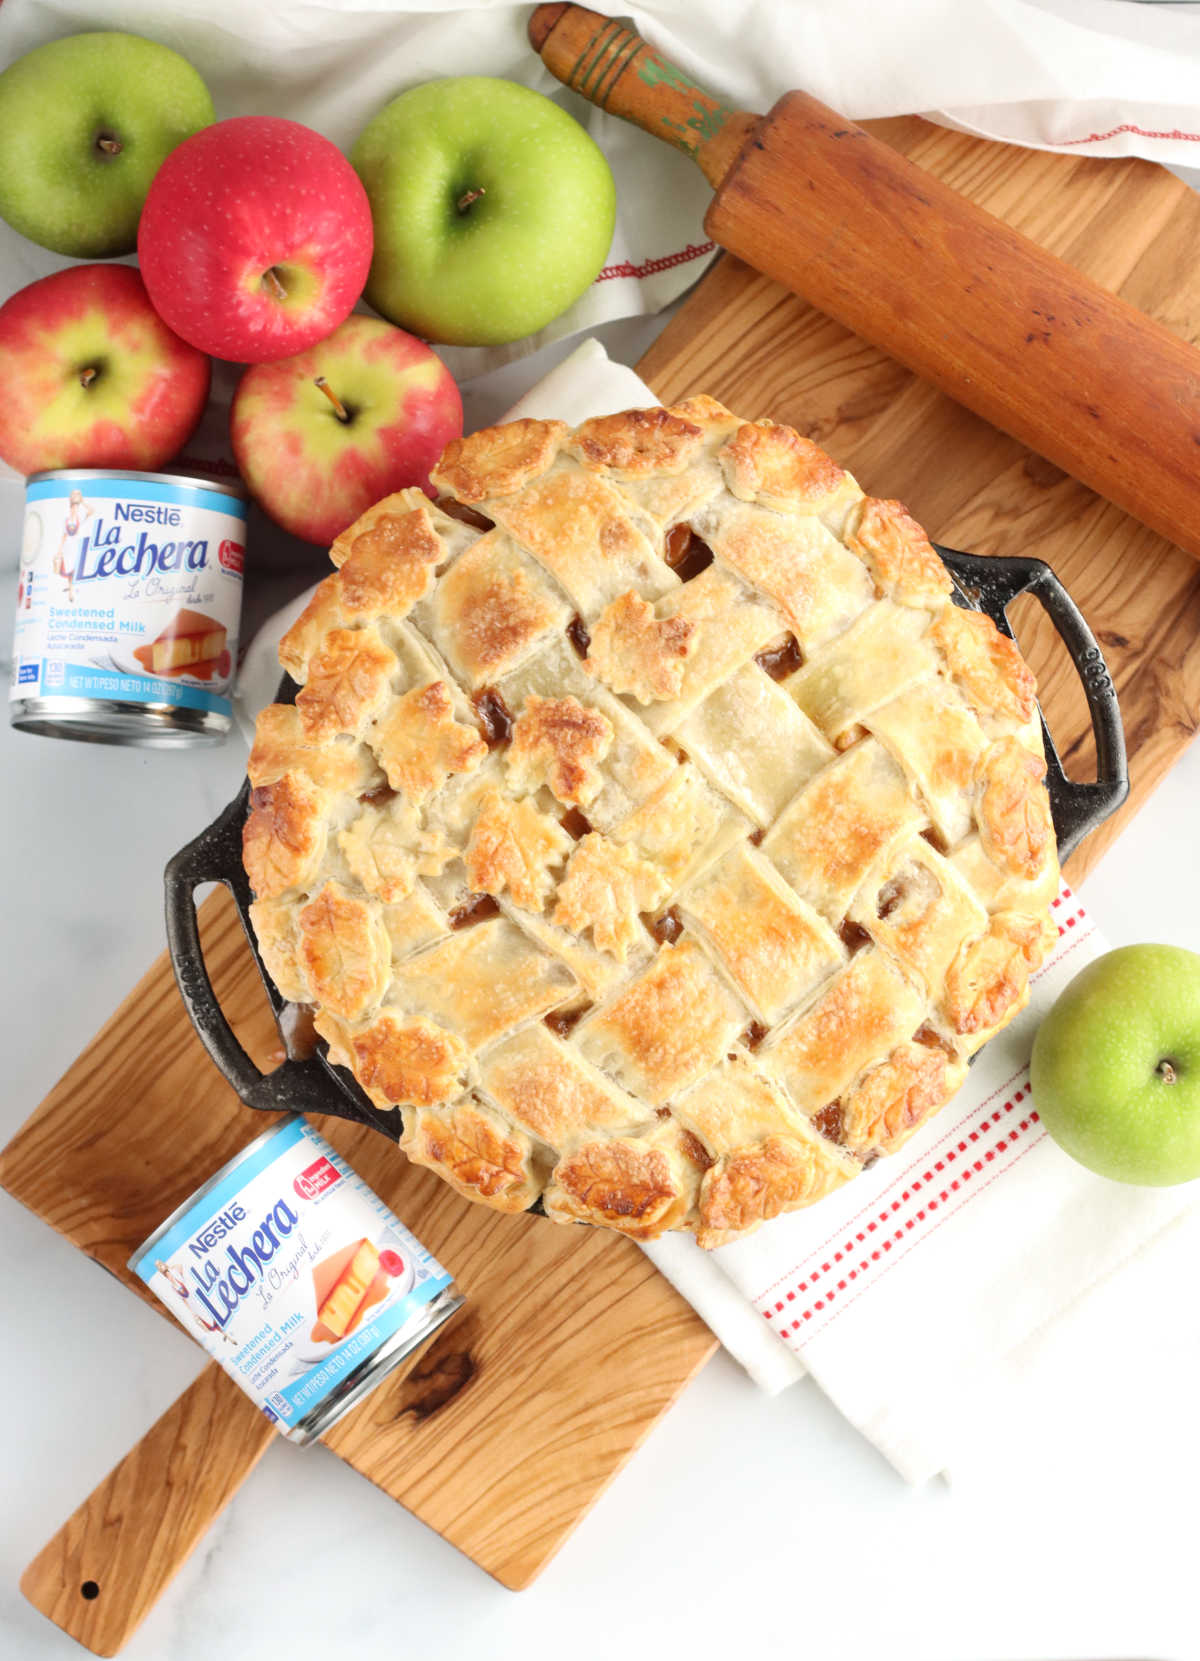 Apple pie with lattice crust on wooden cutting board, apples around it.